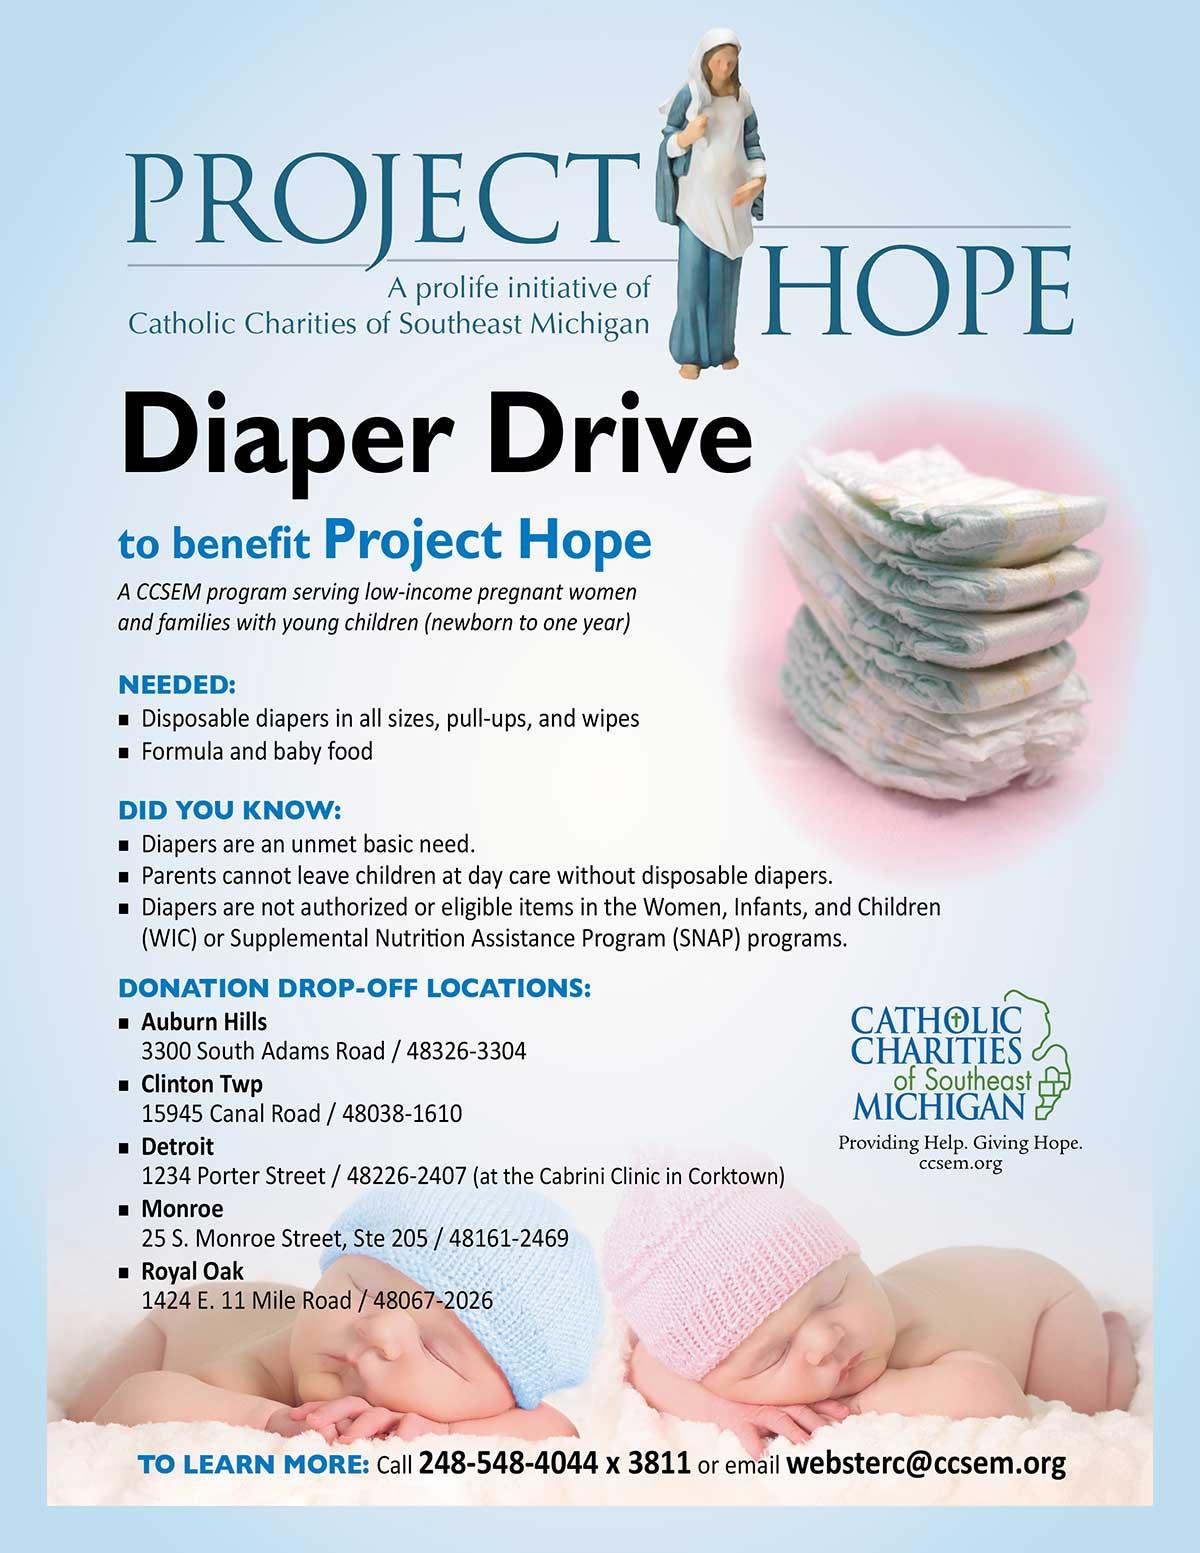 Diaper Drive flyer